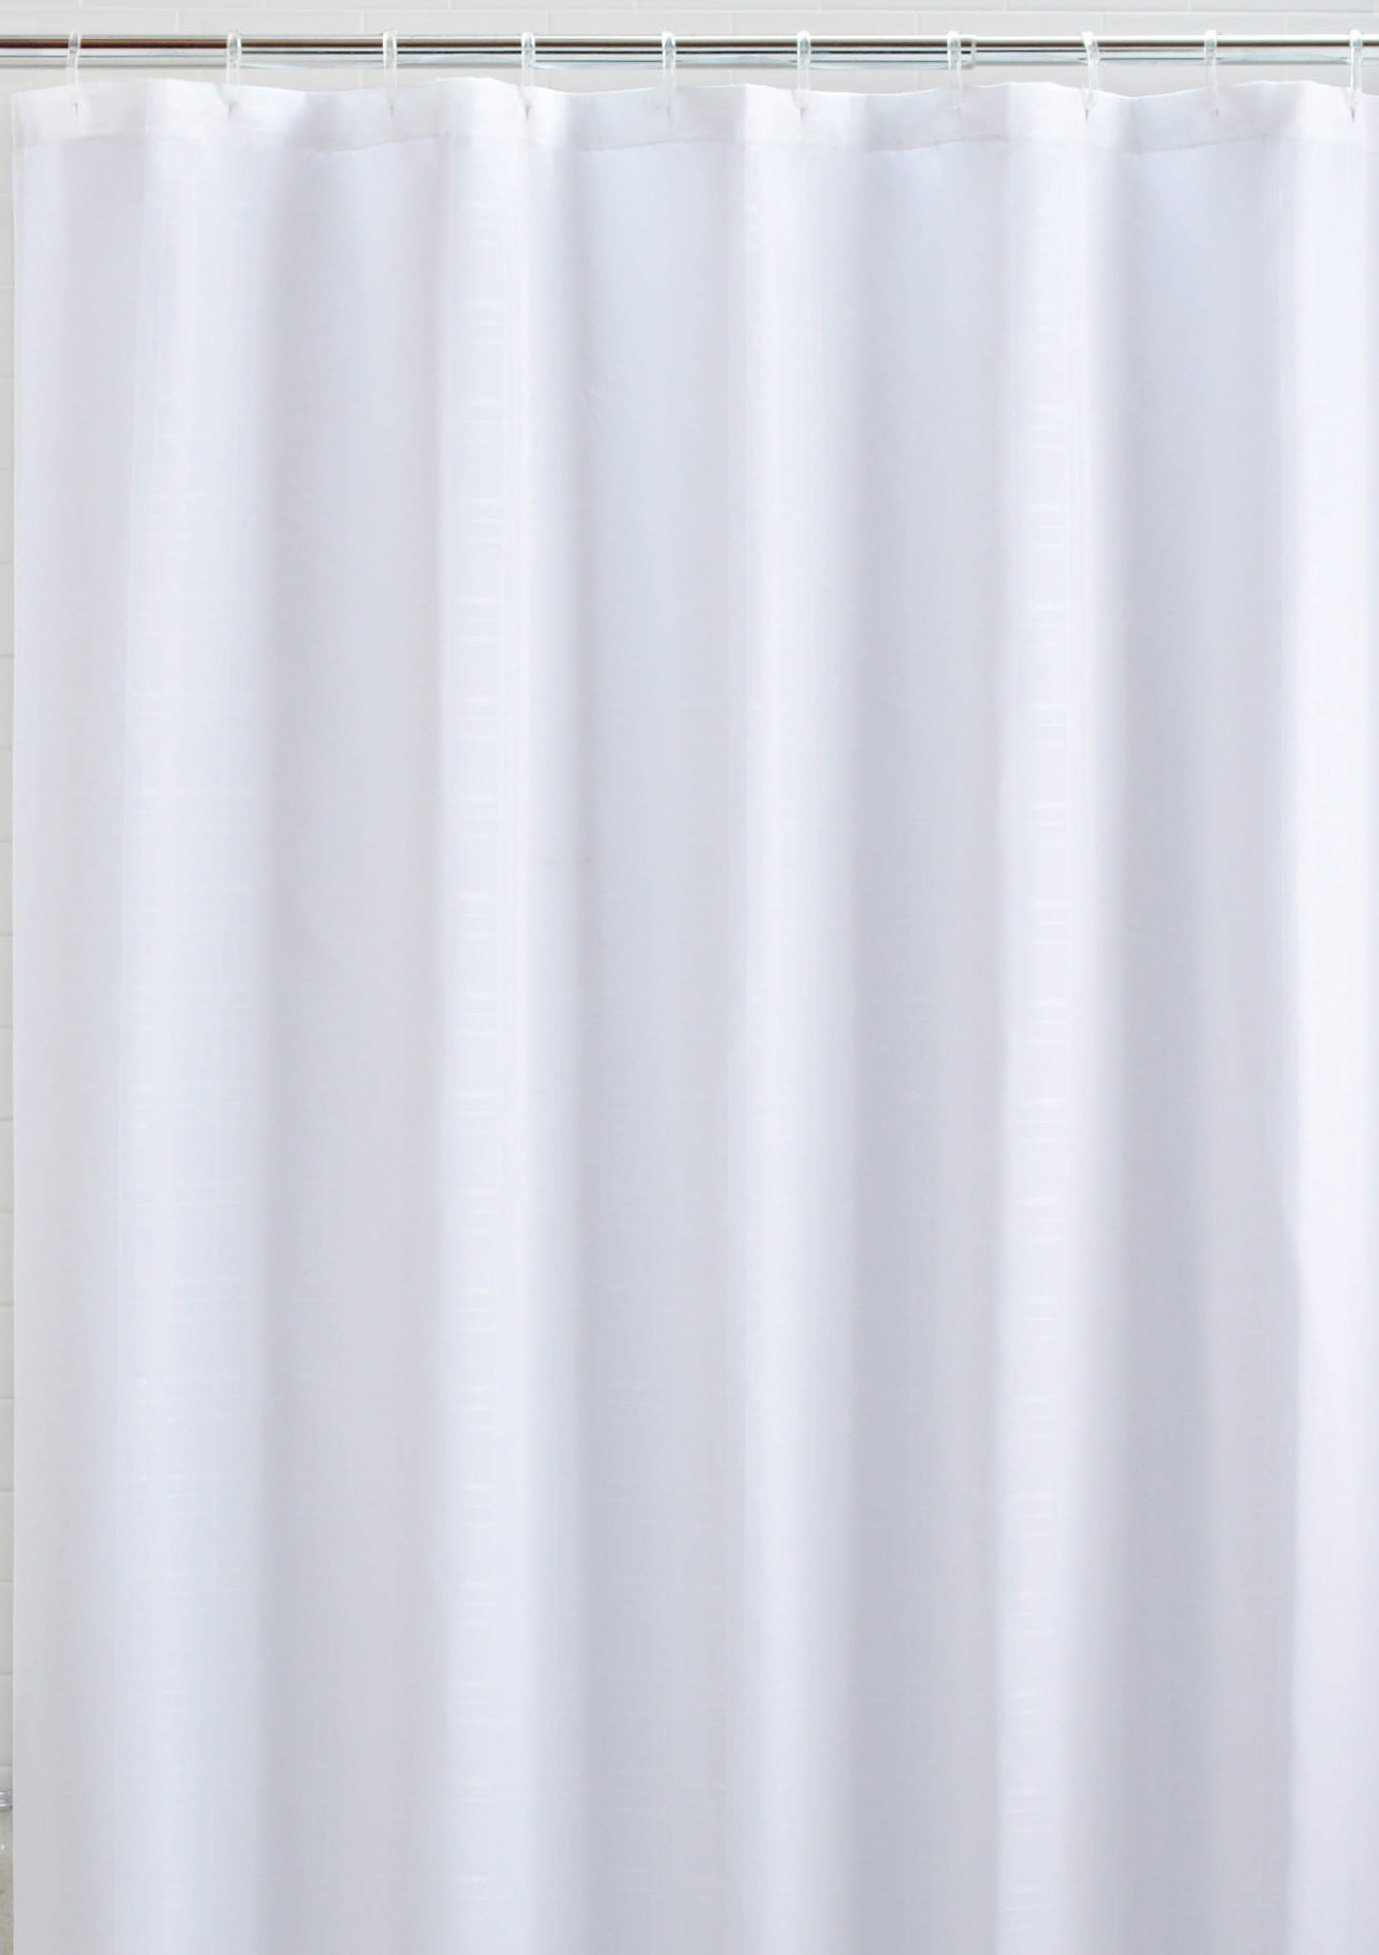 Mildew Resistant Fabric Shower Curtain Waterproof/Water-Repellent & Antibacterial, 72x72 - White by LiBa